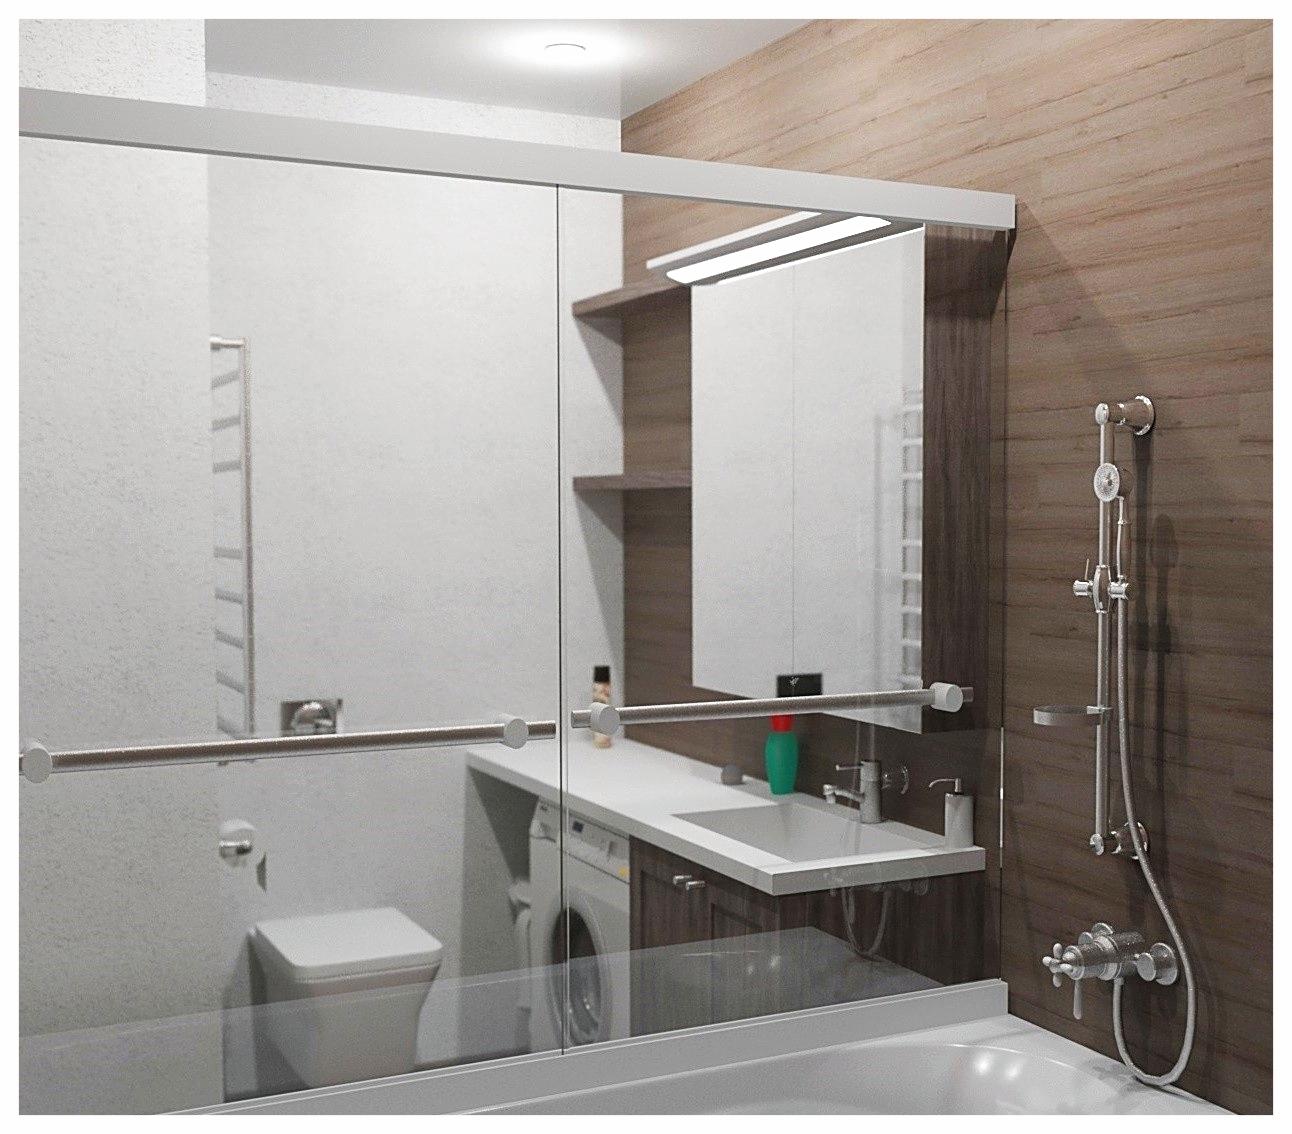 Дизайн интерьеров двухкомнатной квартиры. Санузел 1.